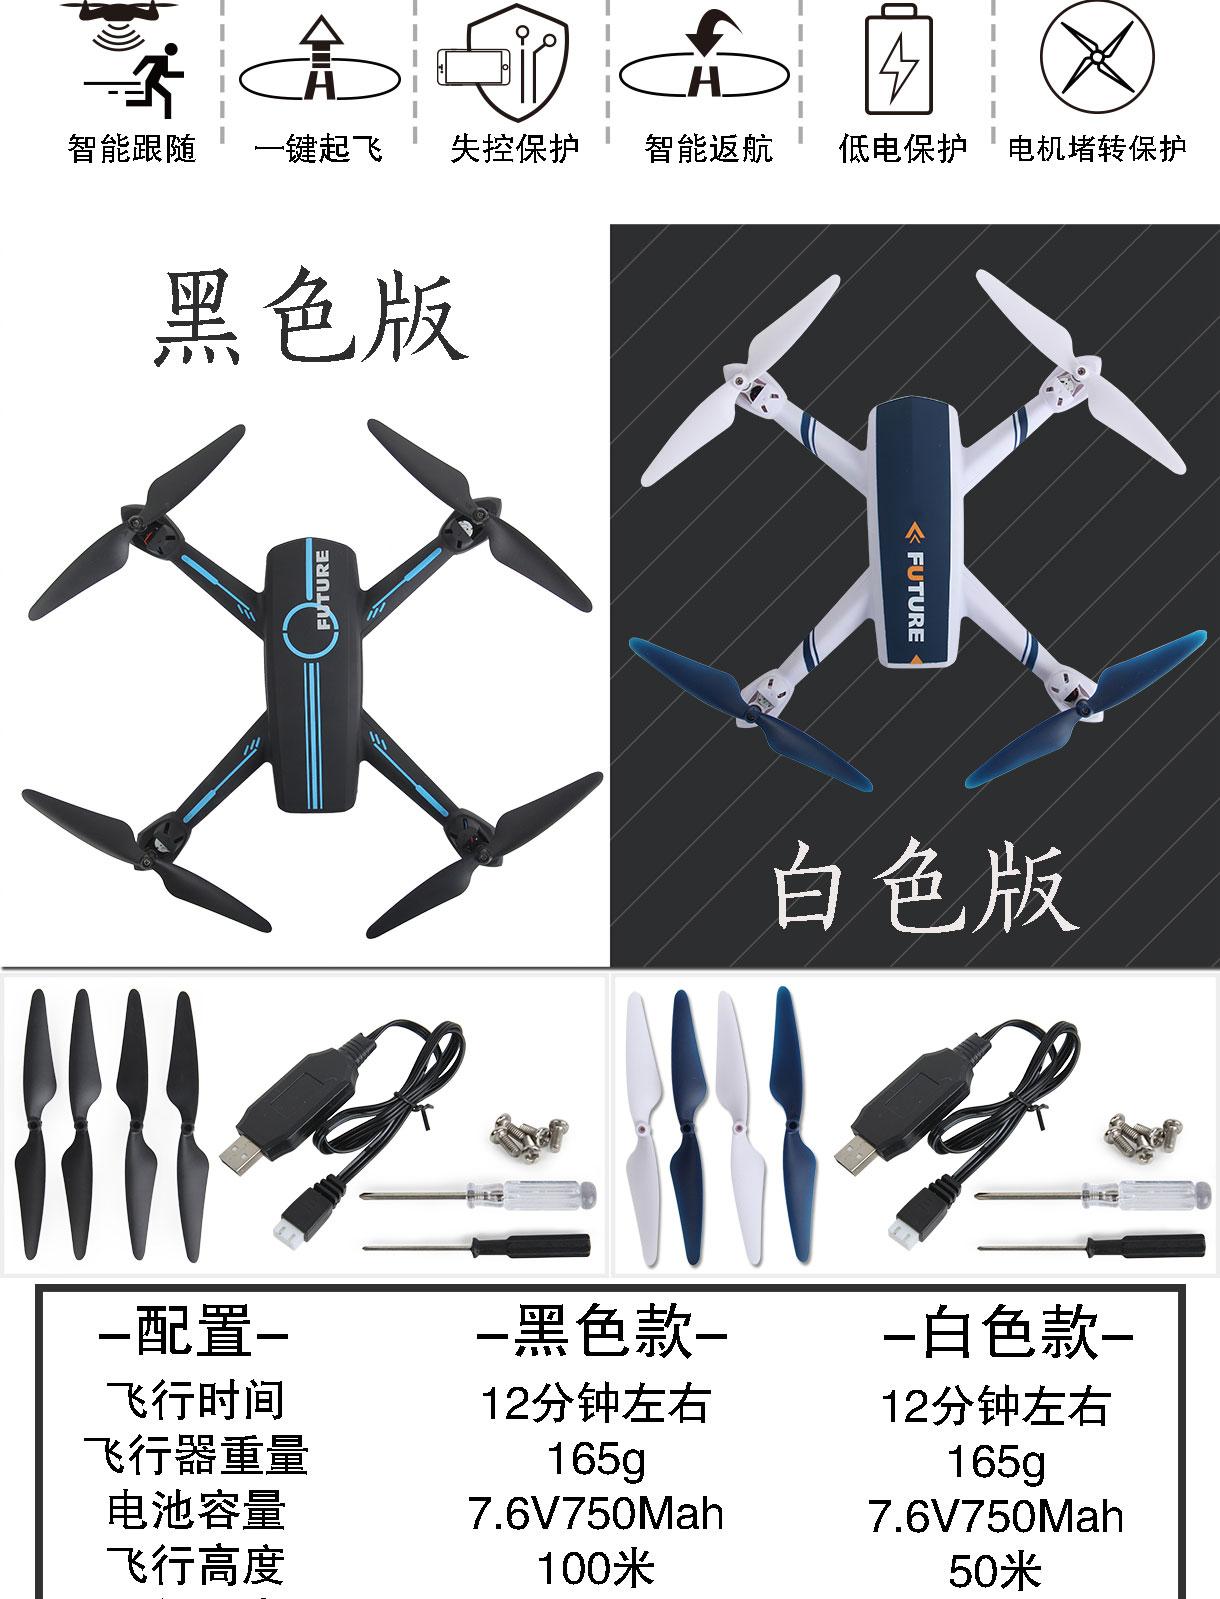 WIFI FPV RC Drone GPS Mining Point Drone 528 RC Quadcopter Full HD 720P Cámara una tecla de salida/aterrizaje/parada vuelo estable - 5